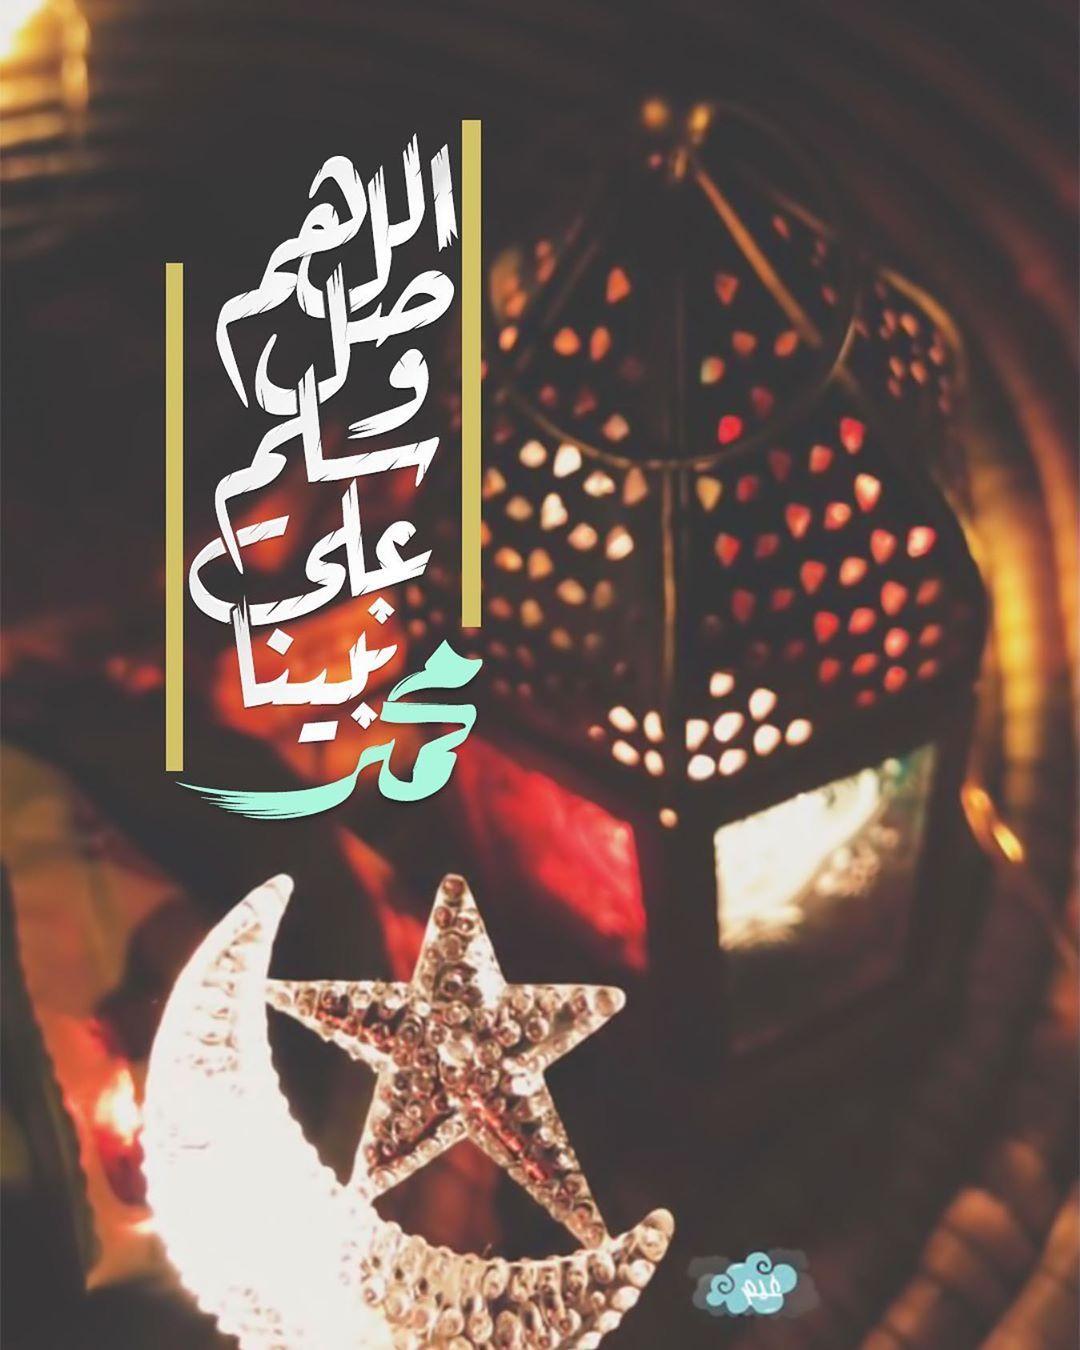 Pin By صورة و كلمة On محمد رسول الله ﷺ Christmas Ornaments Holiday Decor Novelty Christmas